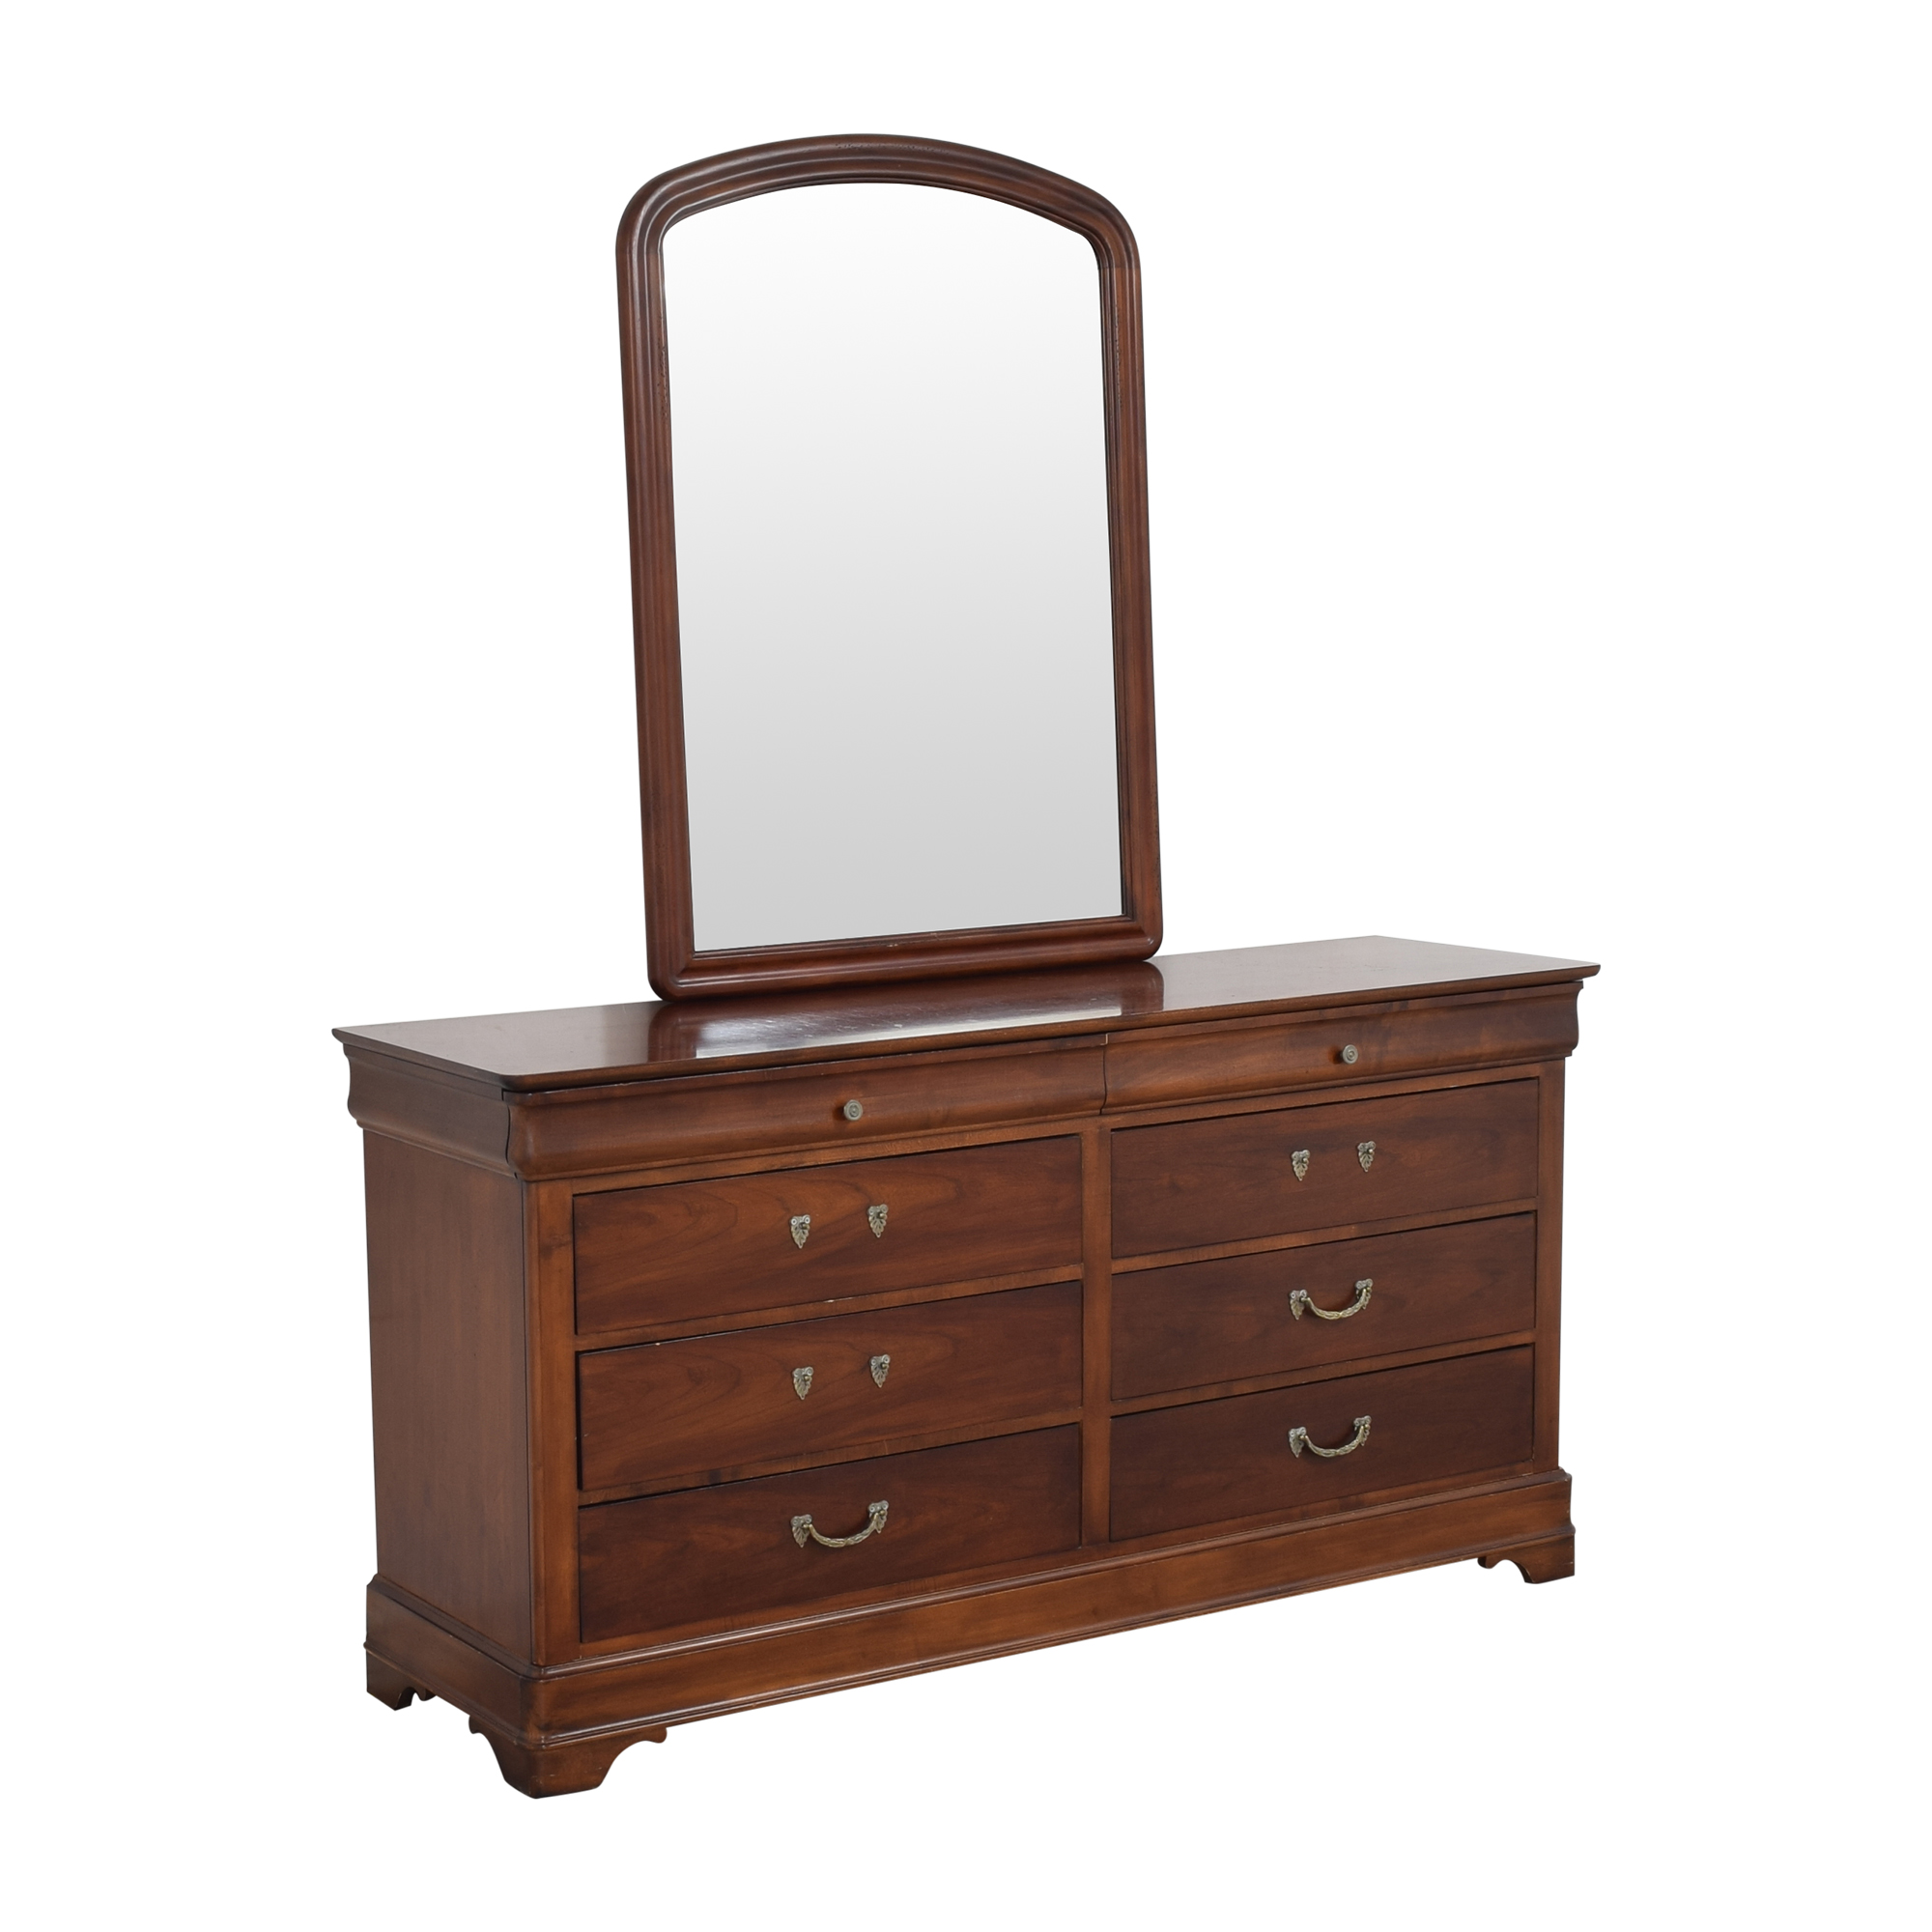 Drexel Heritage Drexel Heritage Delshire Double Dresser with Mirror